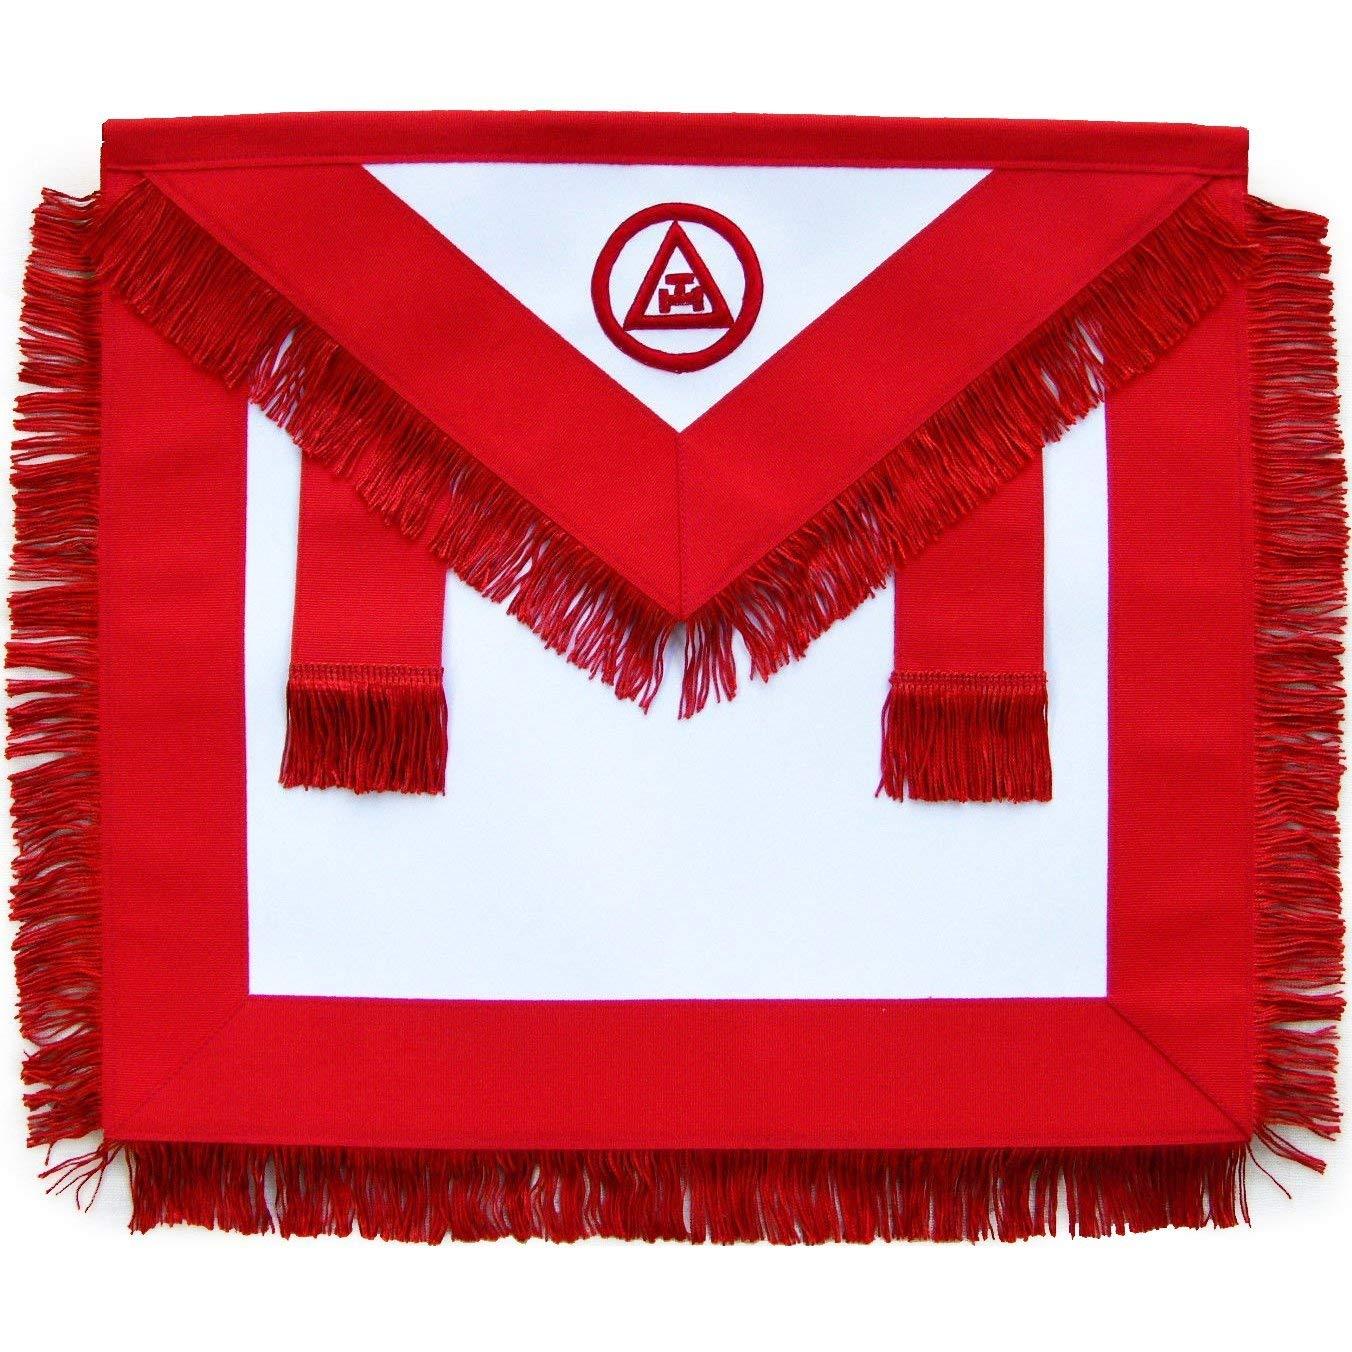 Bricks Masons Masonic Royal Arch Member RAM Apron with Fringe-Lambskin by Bricks Masons